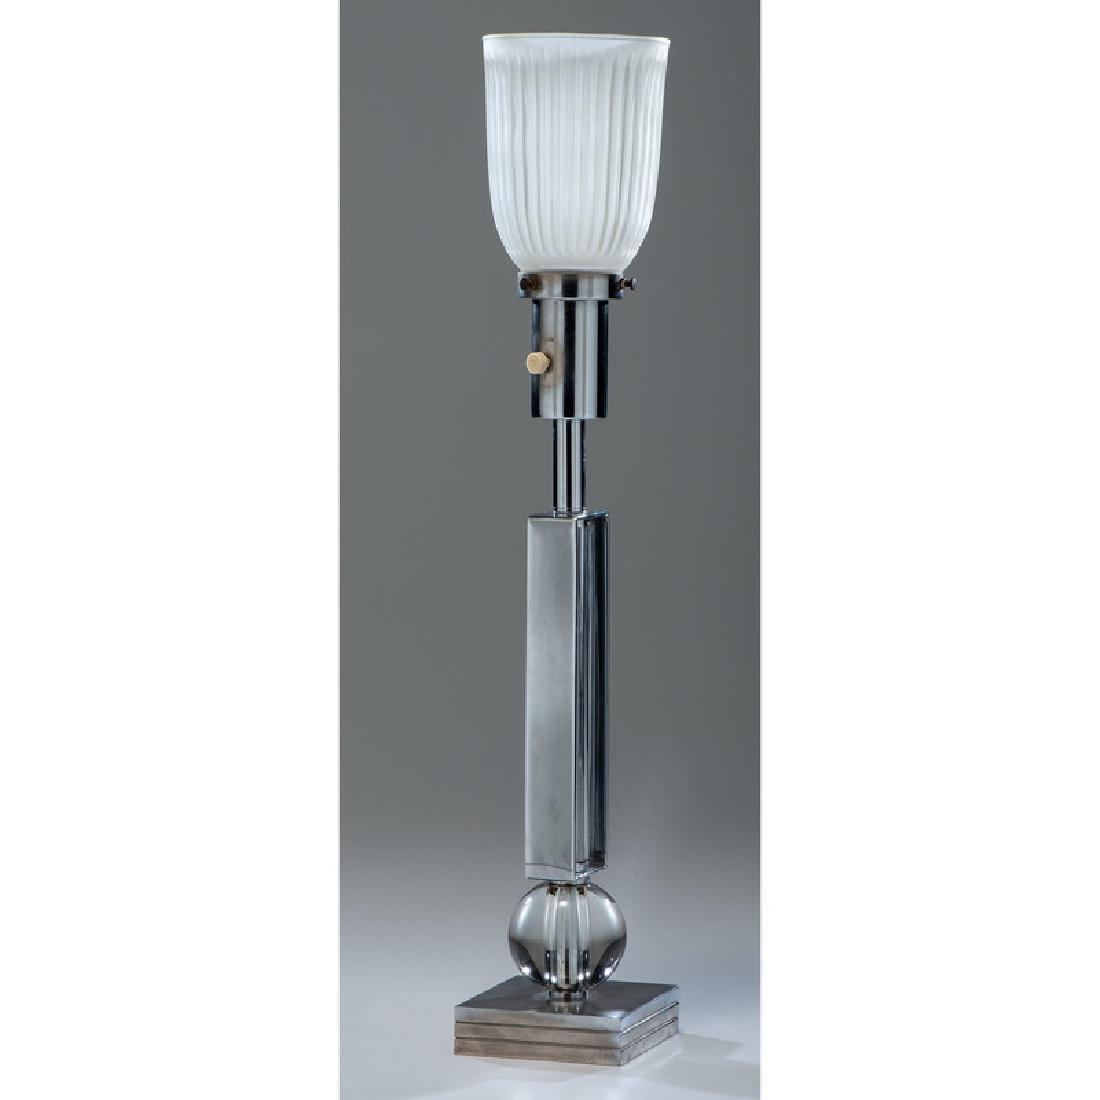 Gilbert Rohde Table Lamp - 2